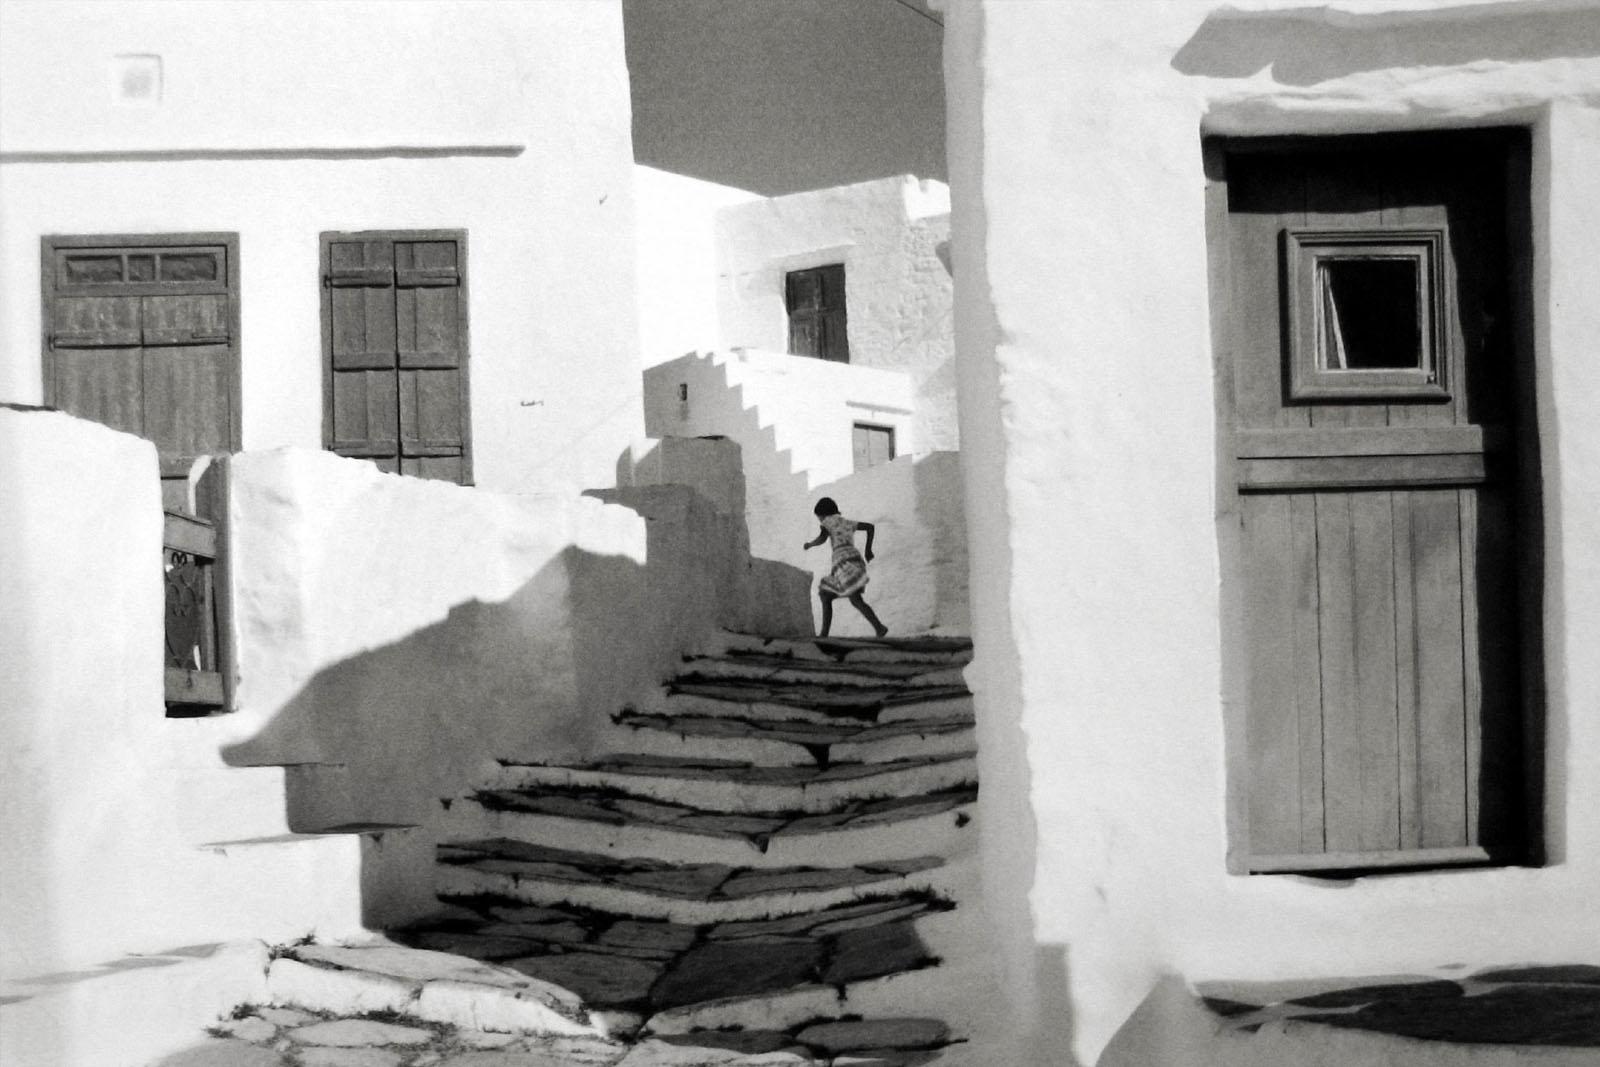 Henri Cartier-Bresson: The Eye of the Century